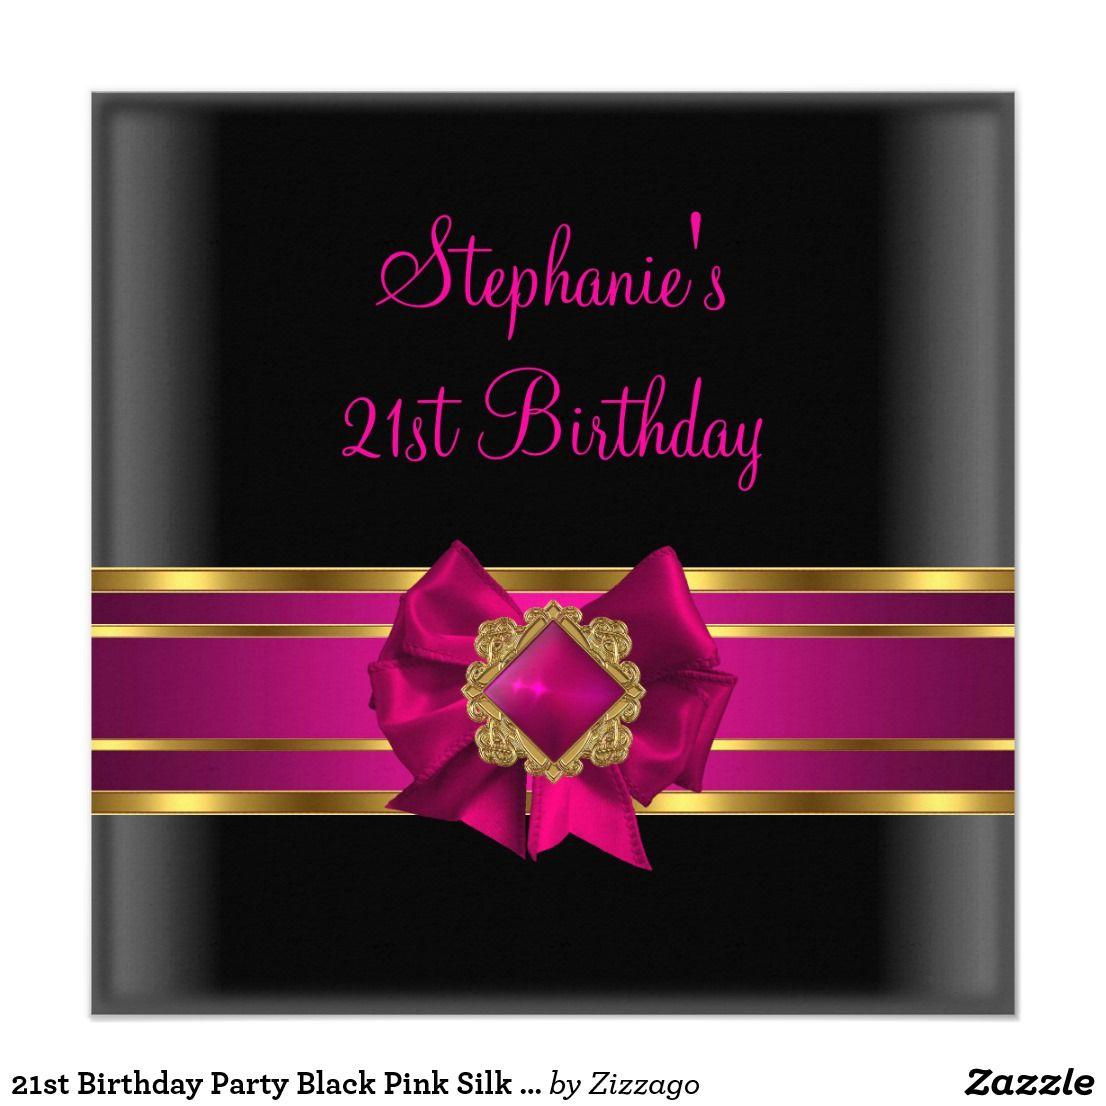 21st Birthday Party Black Pink Silk Gold Jewel Card | 21st birthday ...